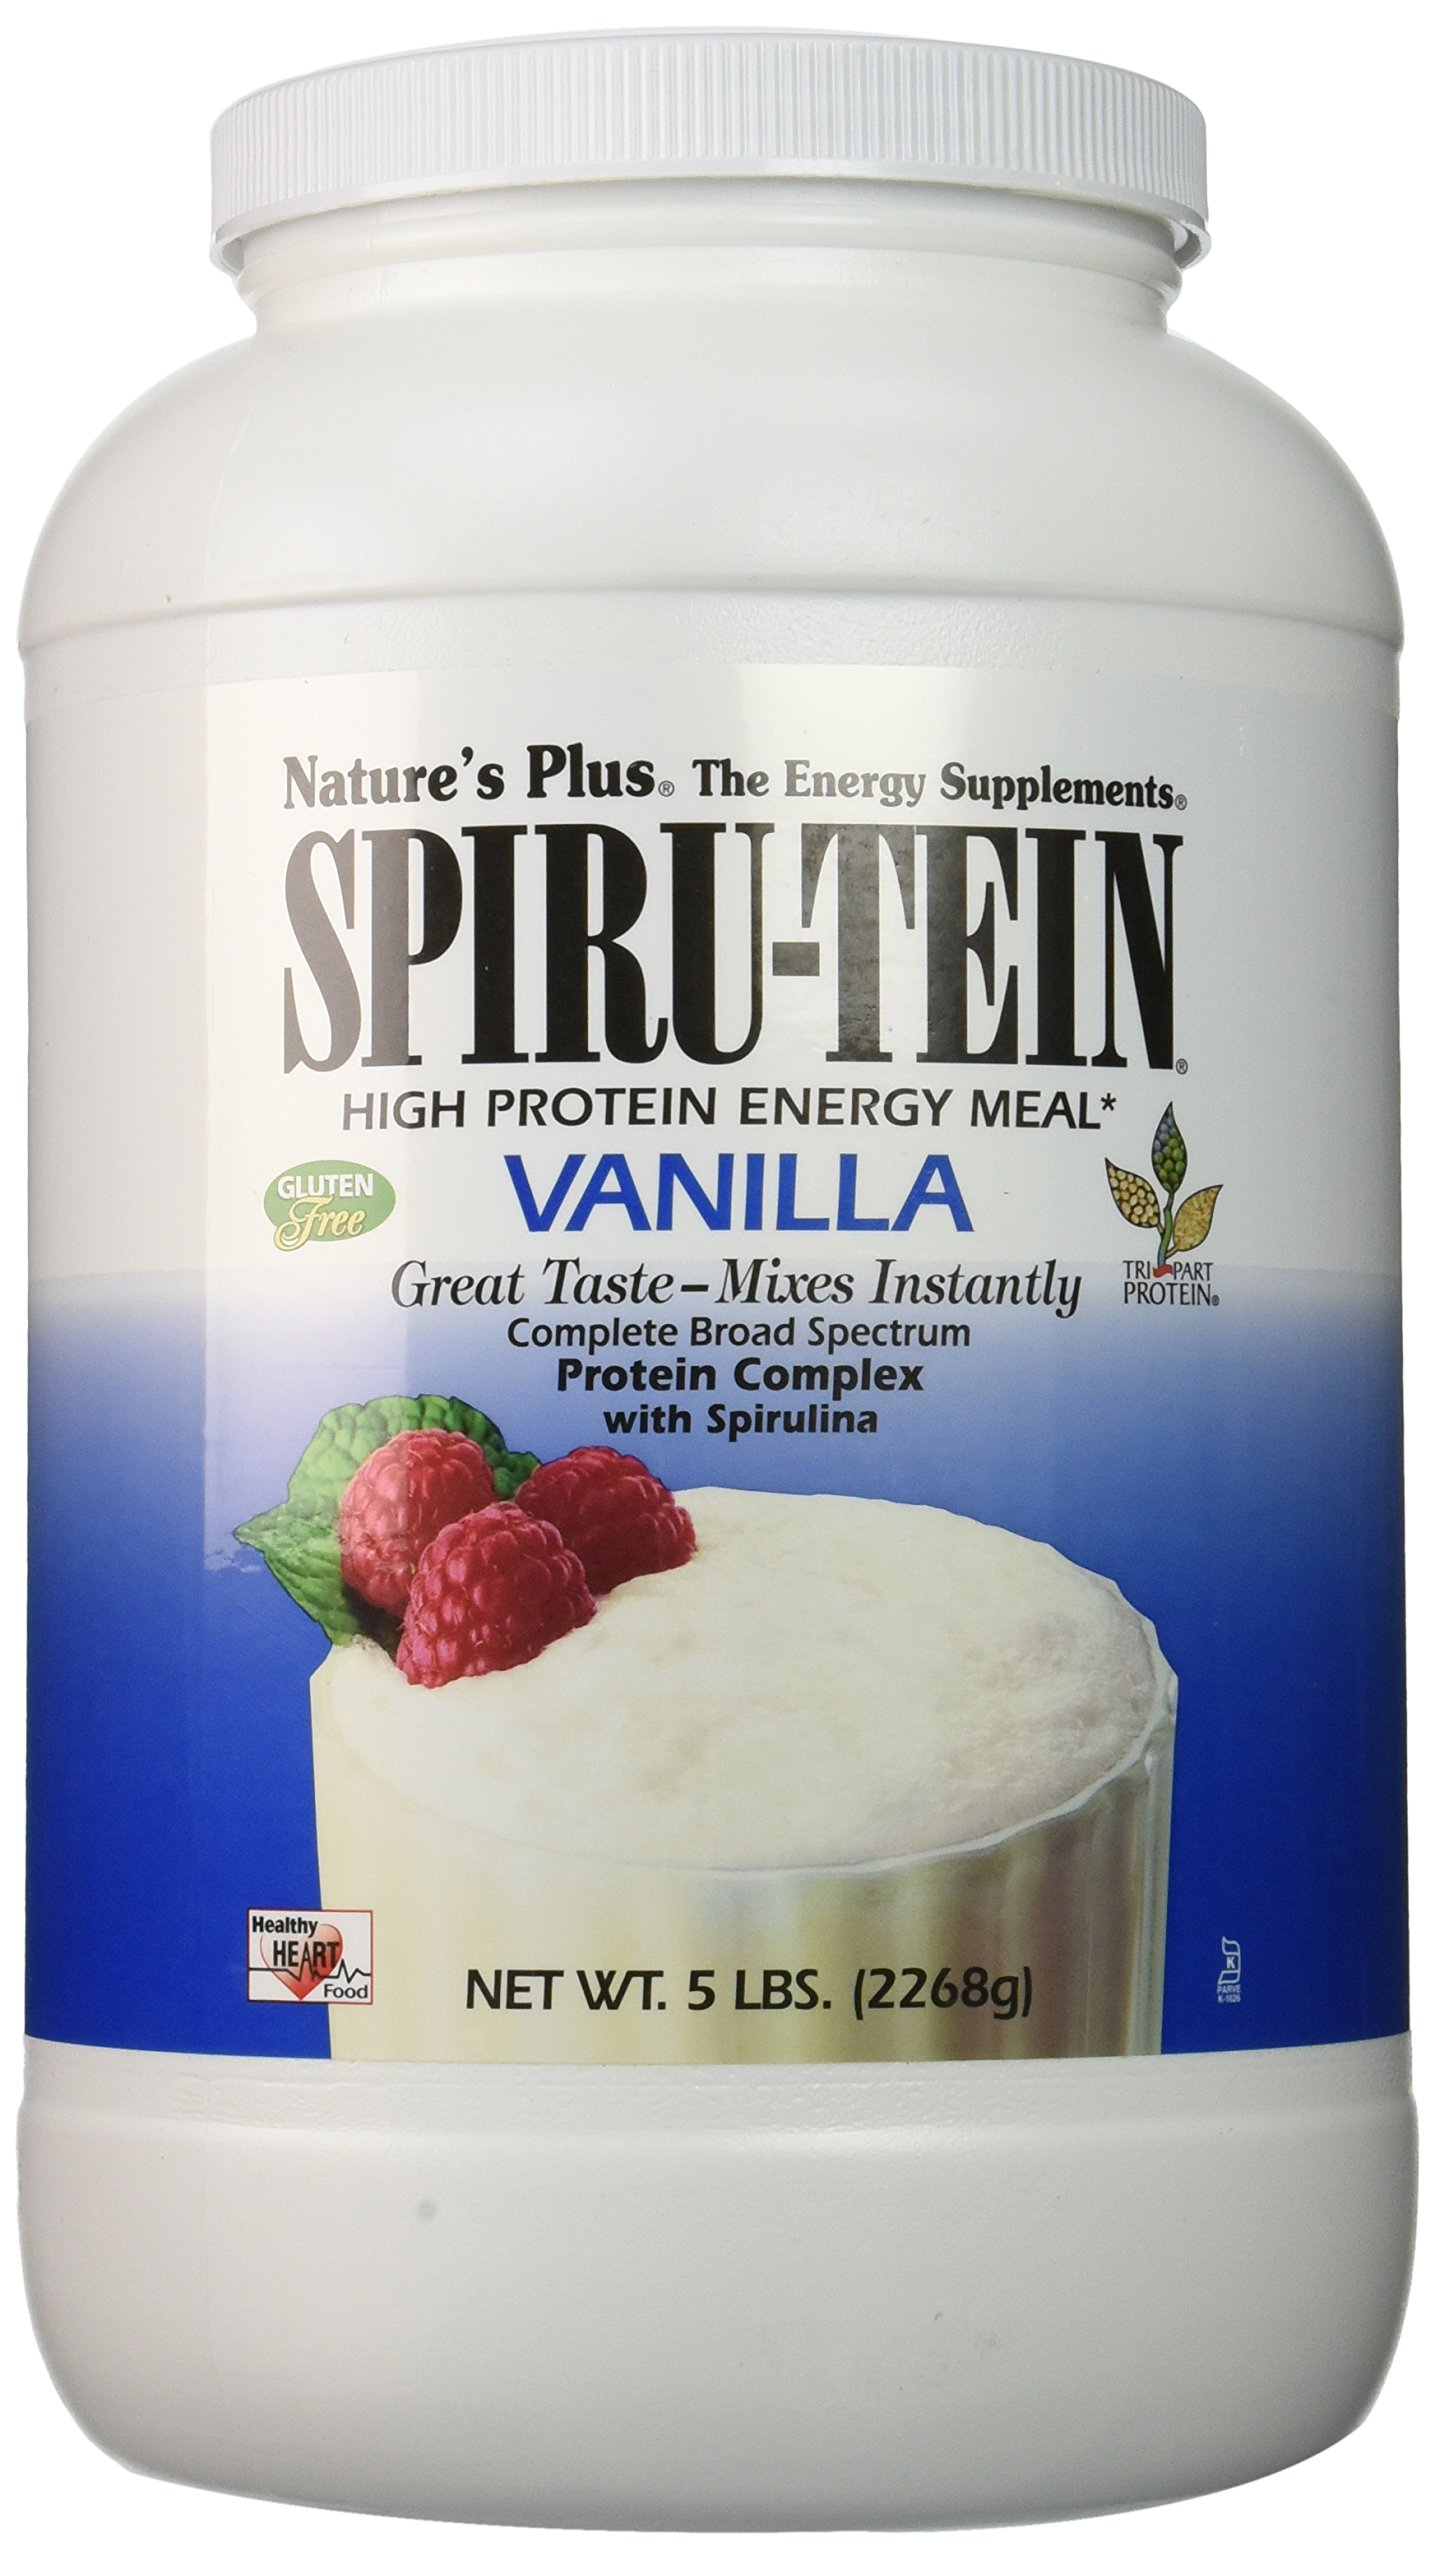 Nature's Plus - Vanilla SPIRU-TEIN Shake, 5 lbs Powder